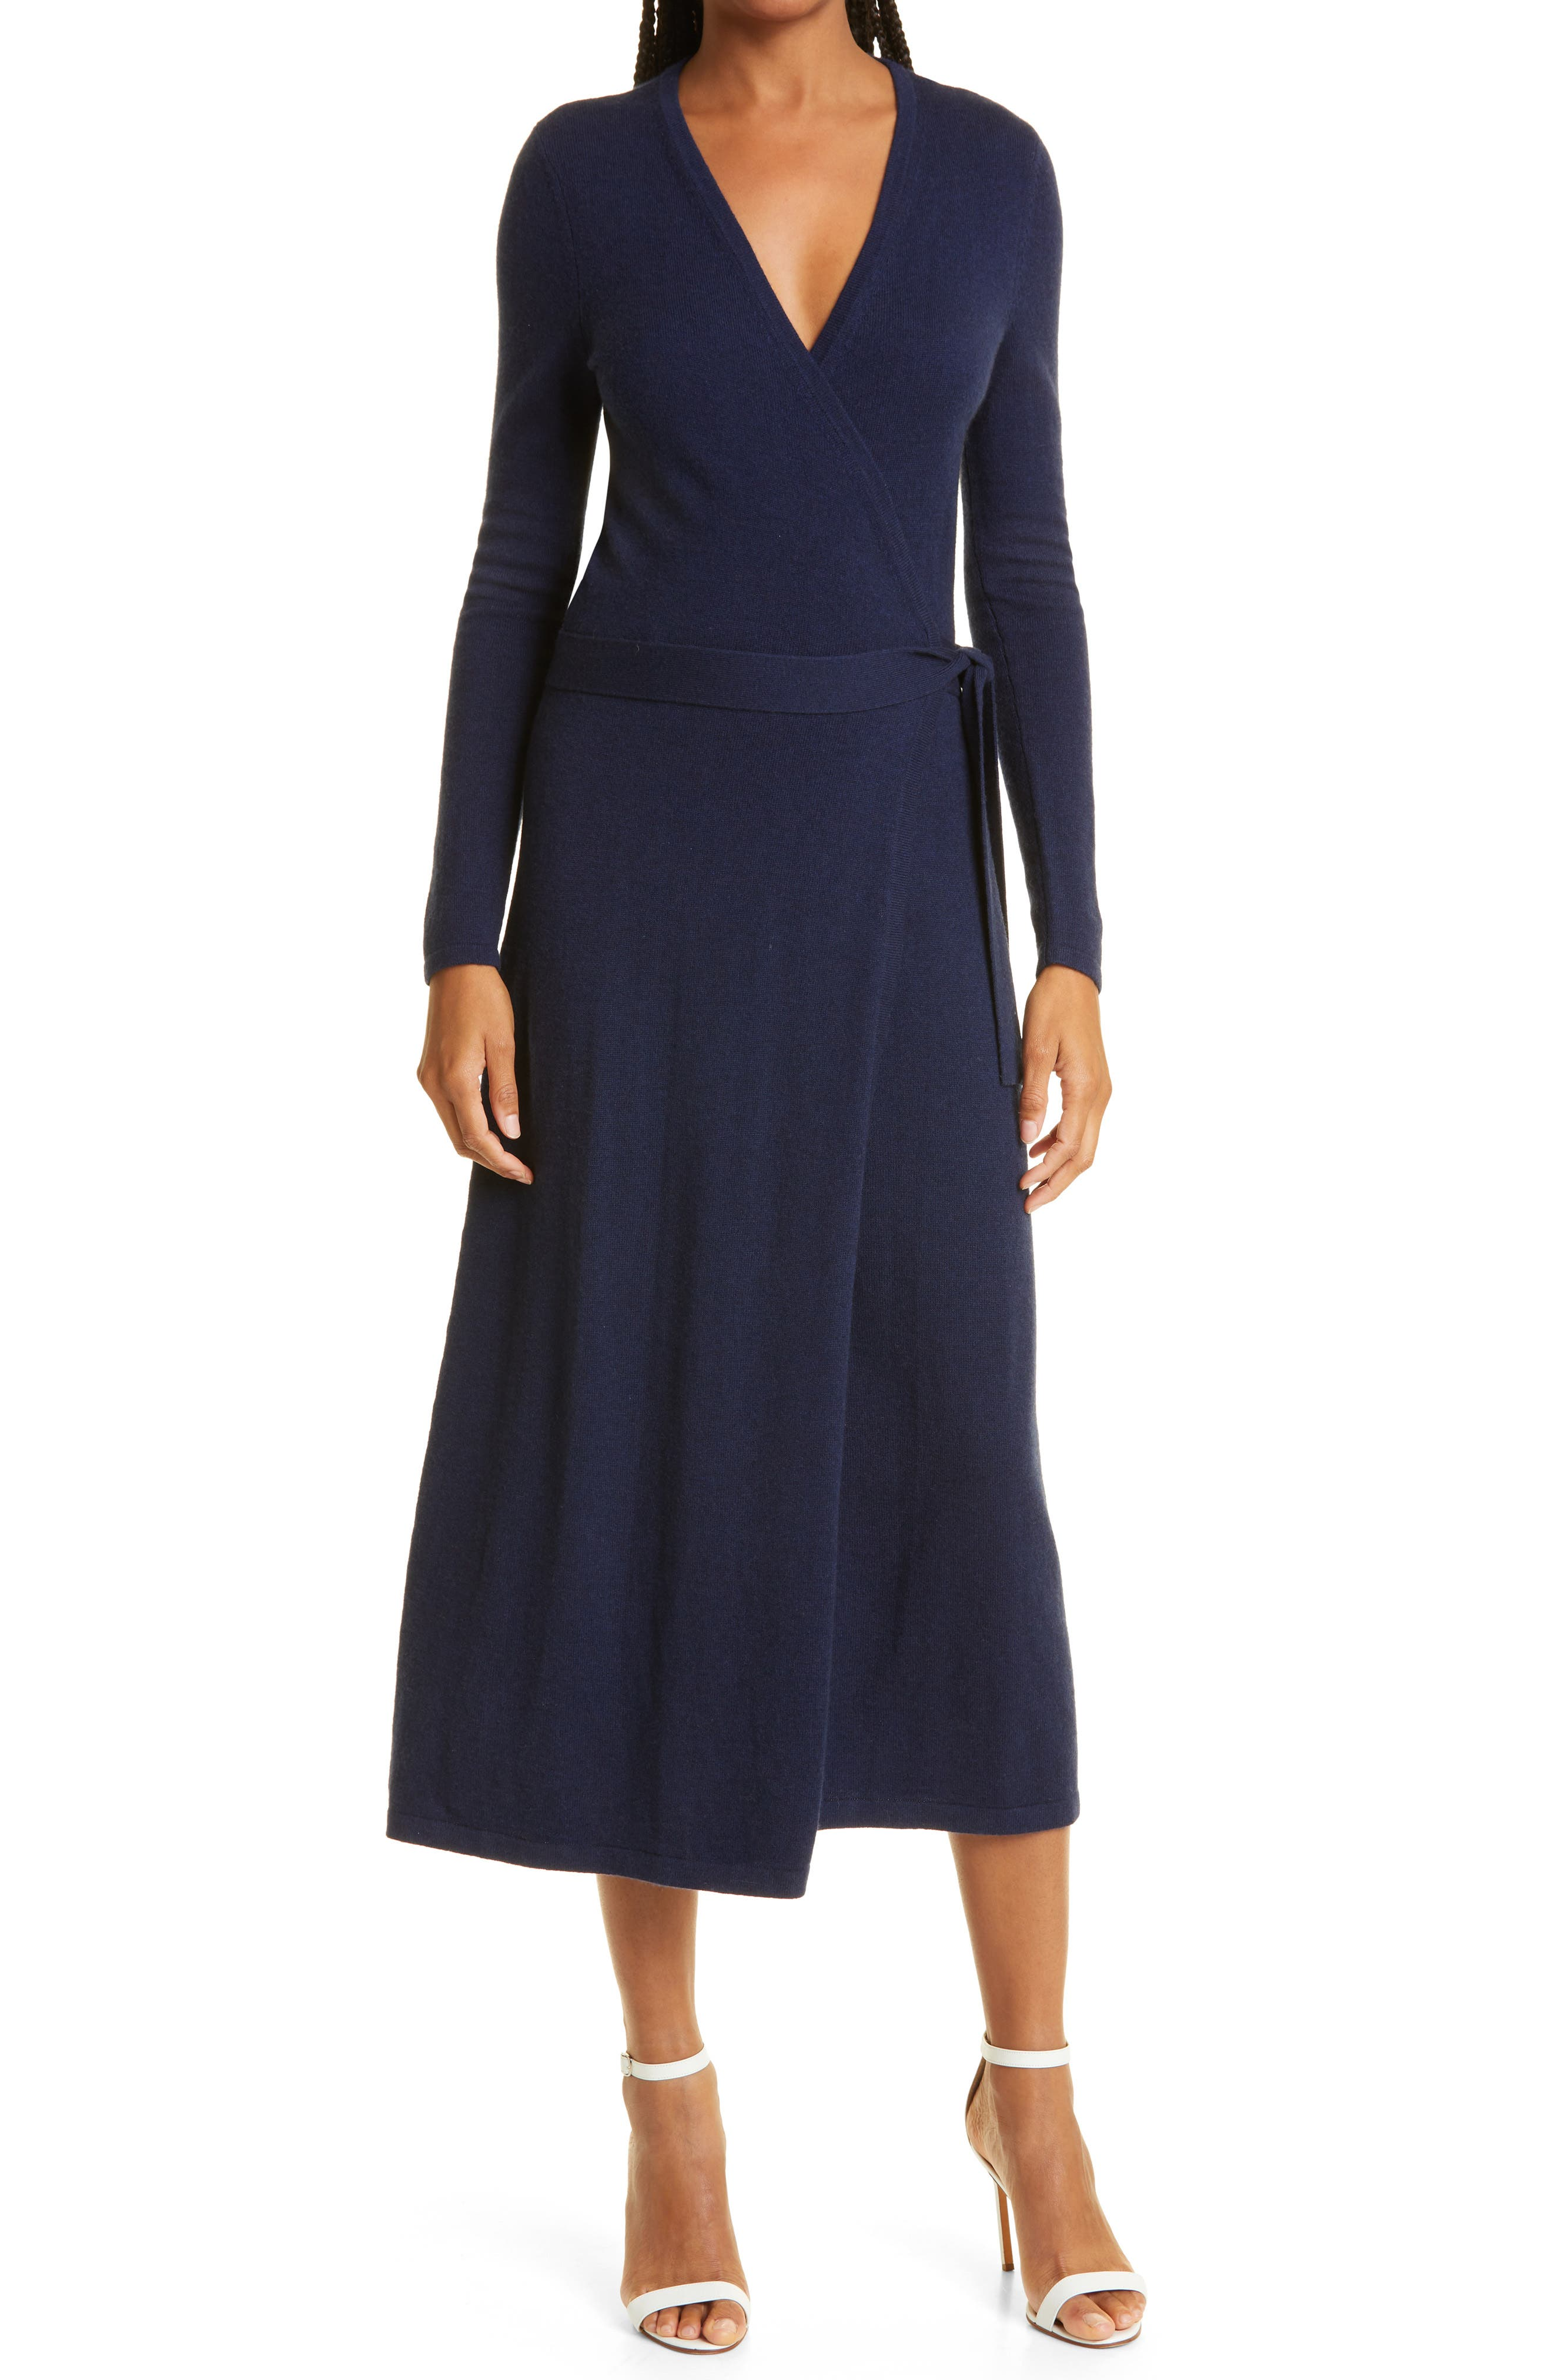 Astrid Long Sleeve Wool & Cashmere Wrap Dress